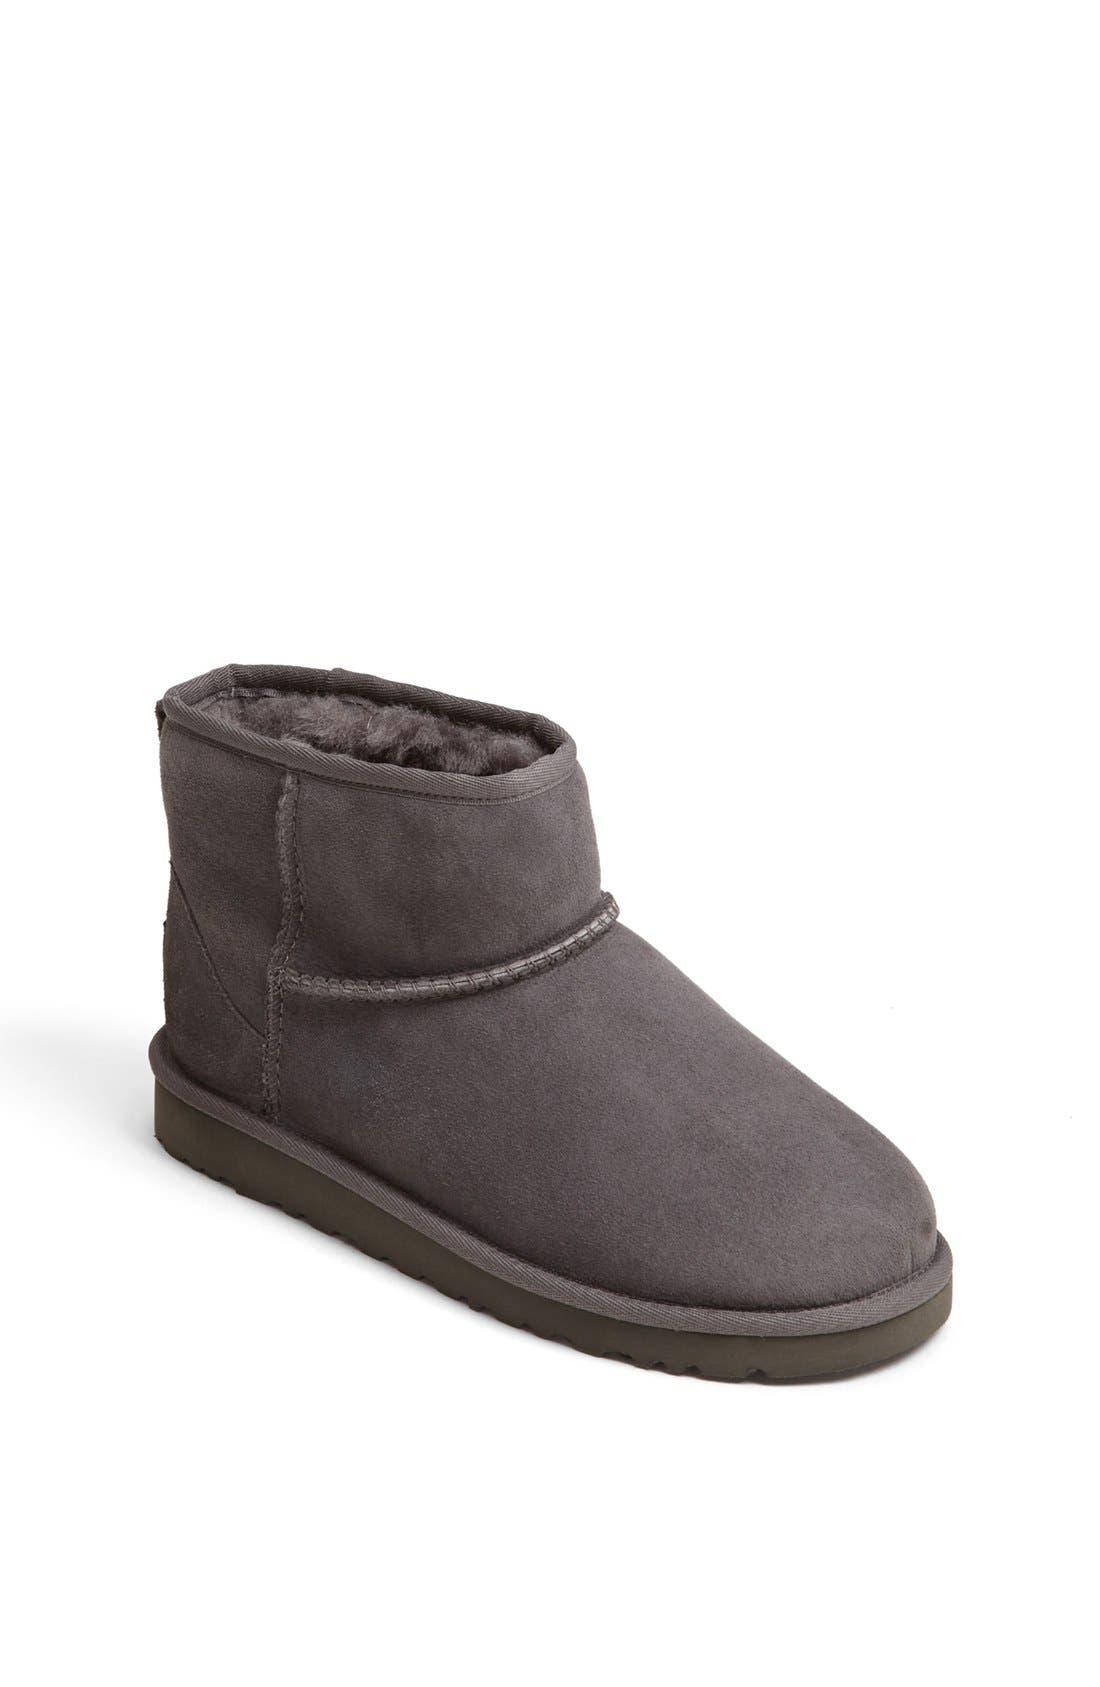 Alternate Image 1 Selected - UGG® 'Classic Mini' Boot (Walker, Toddler & Big Kid)